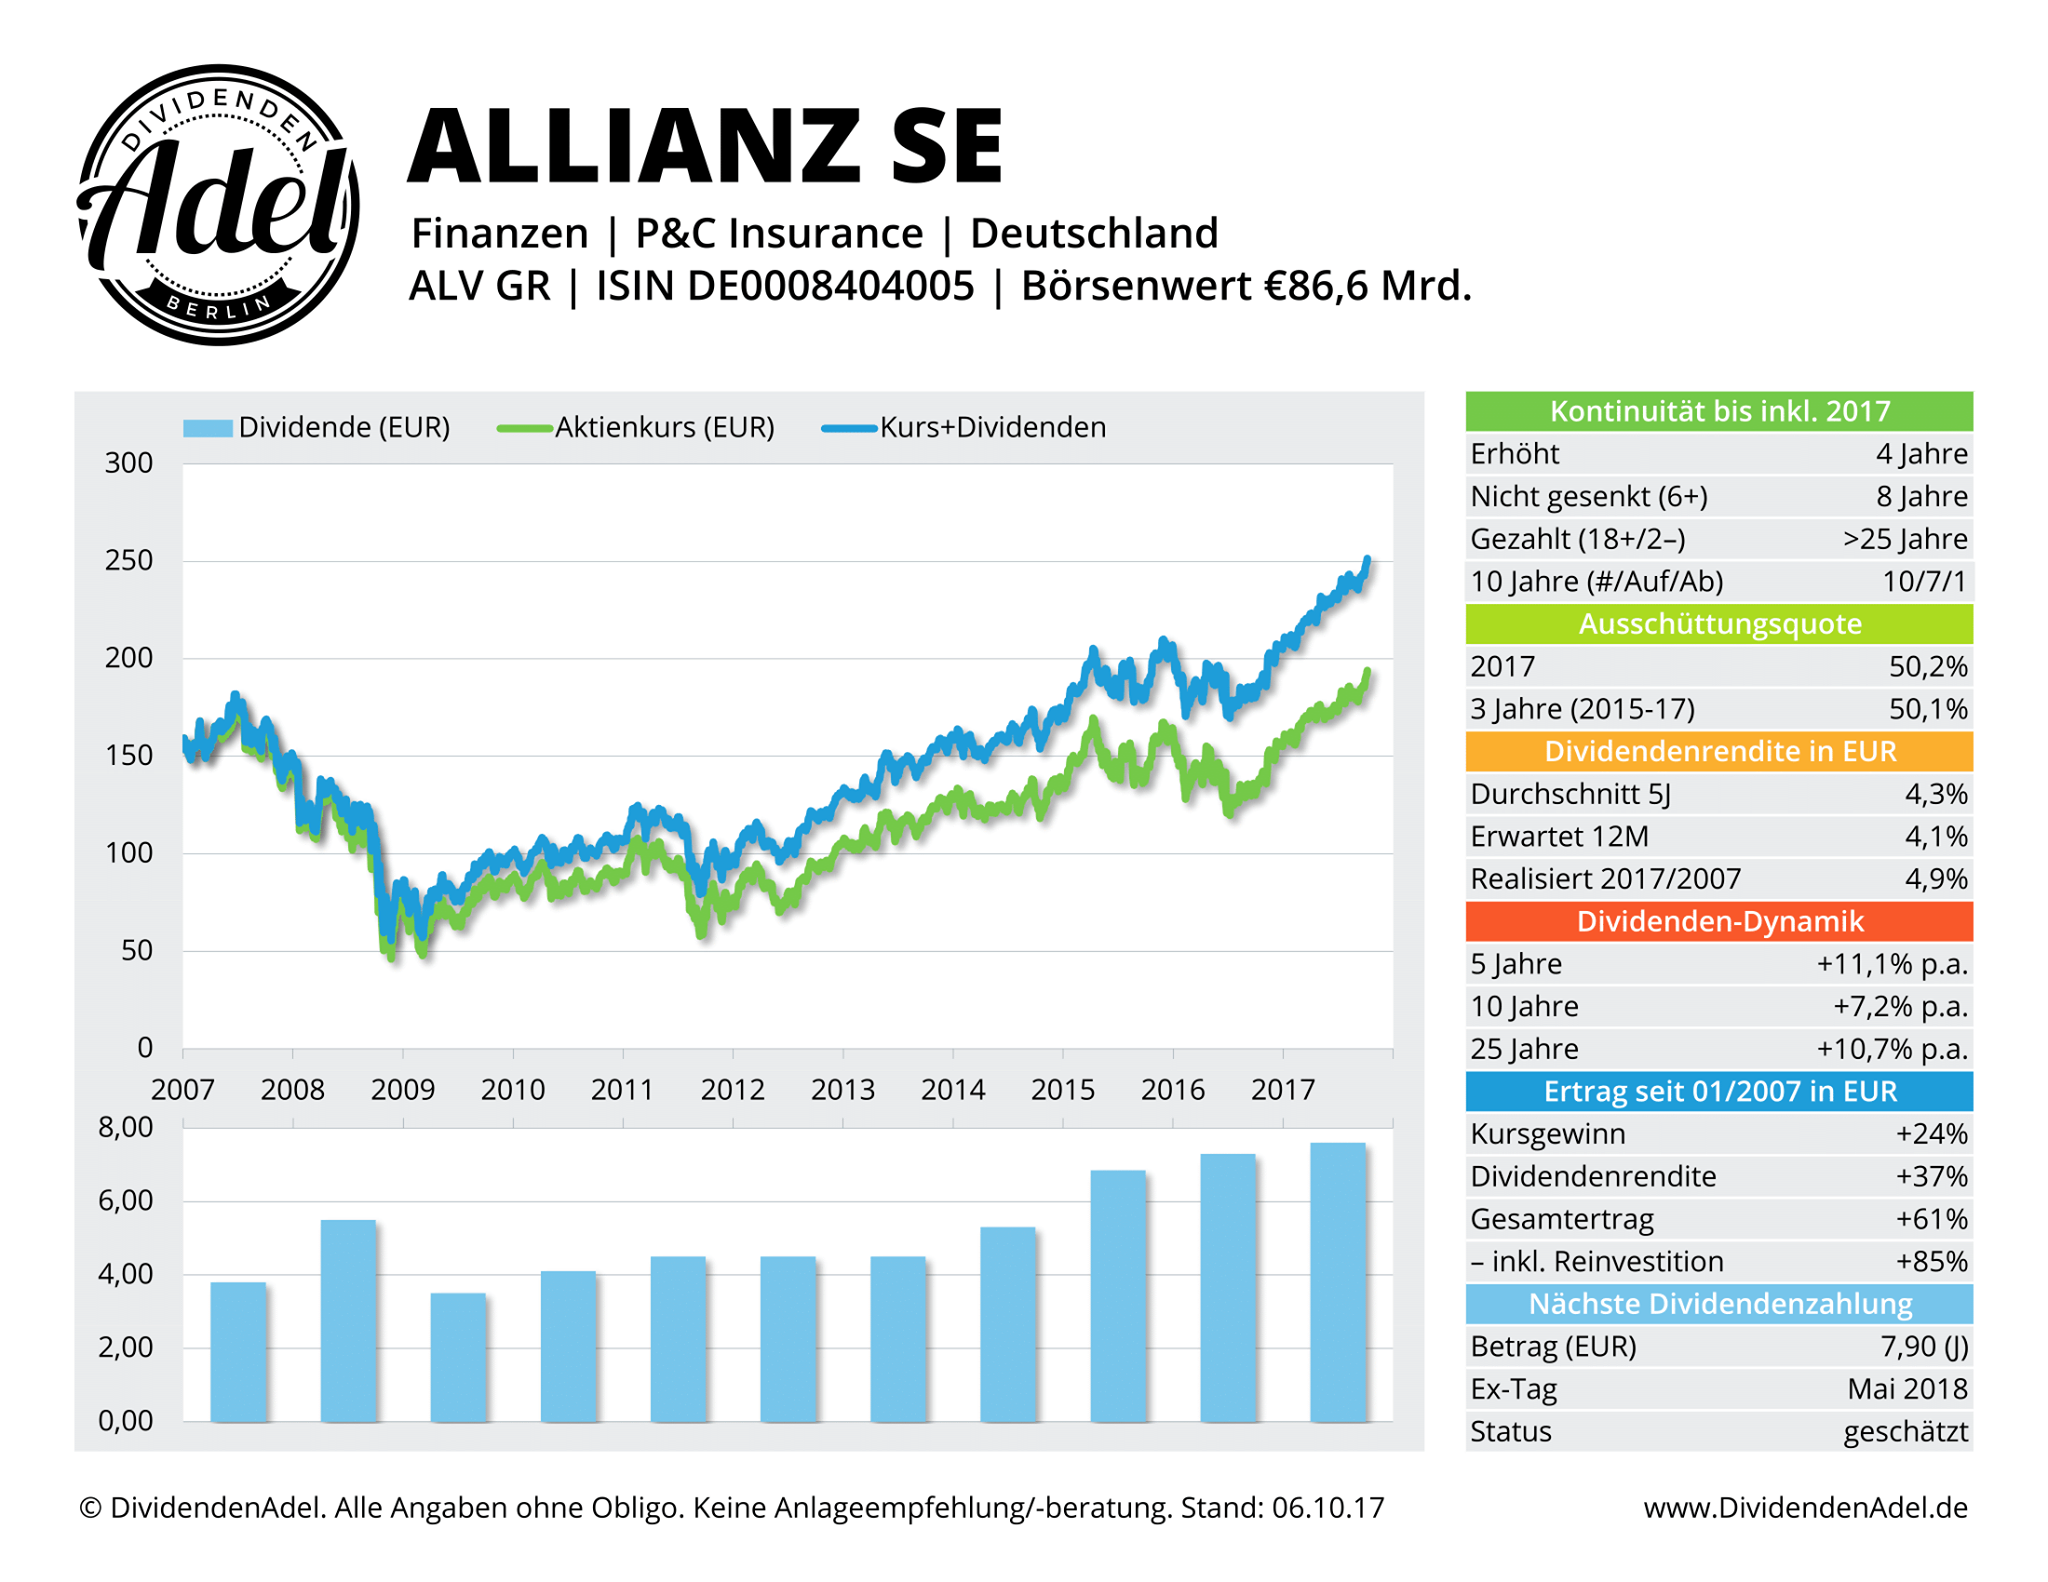 DividendenAdel Profil Allianz